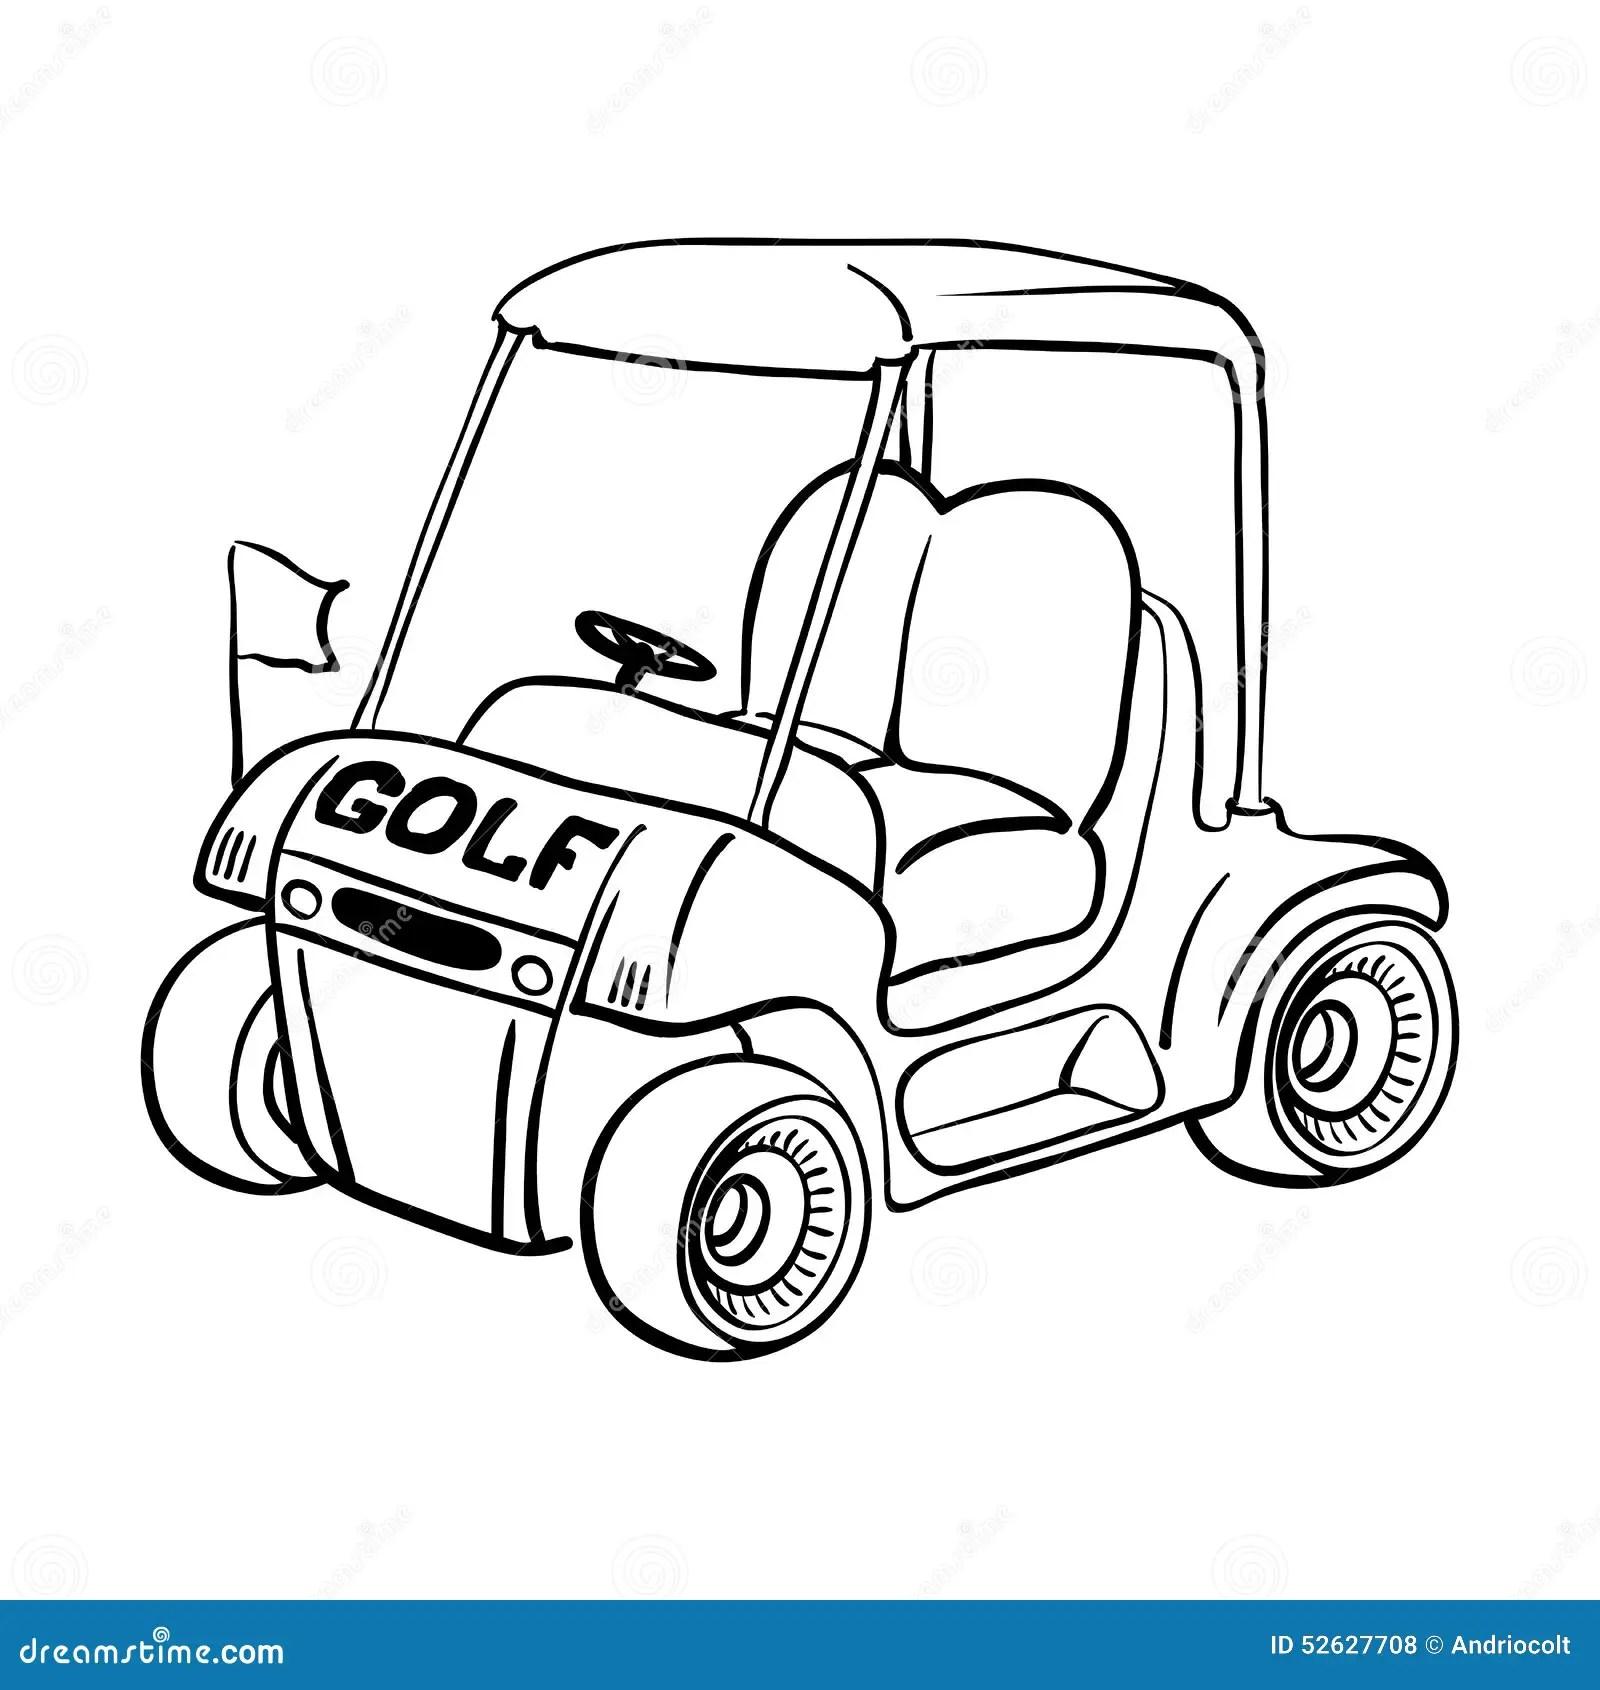 Golf Cart Stock Vector Illustration Of Golfing Motorized